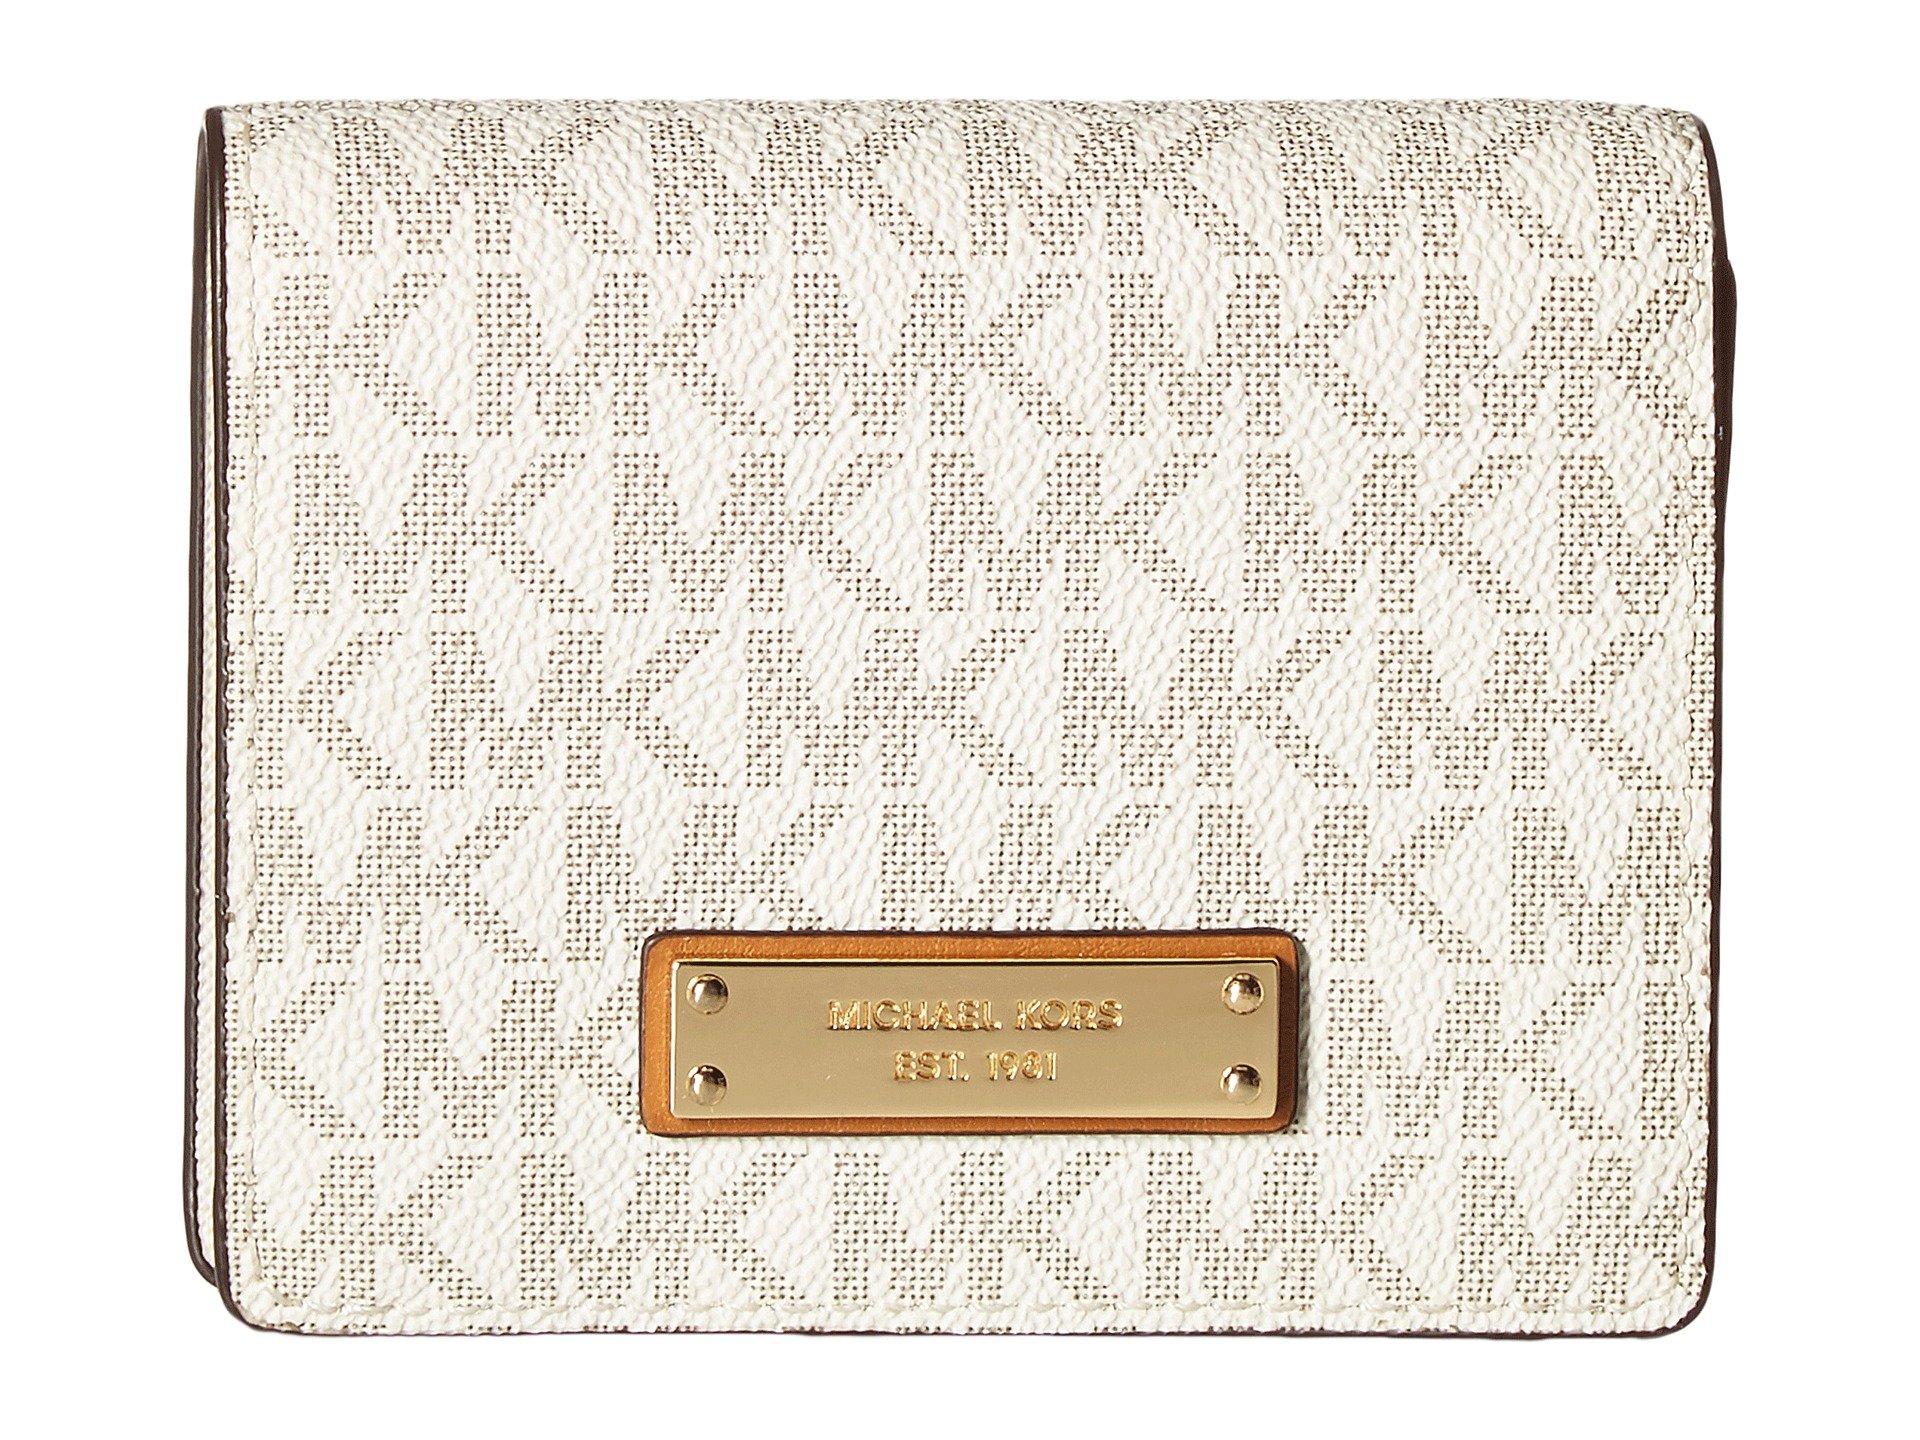 Michael Kors Jet Set Card Holder- Vanilla